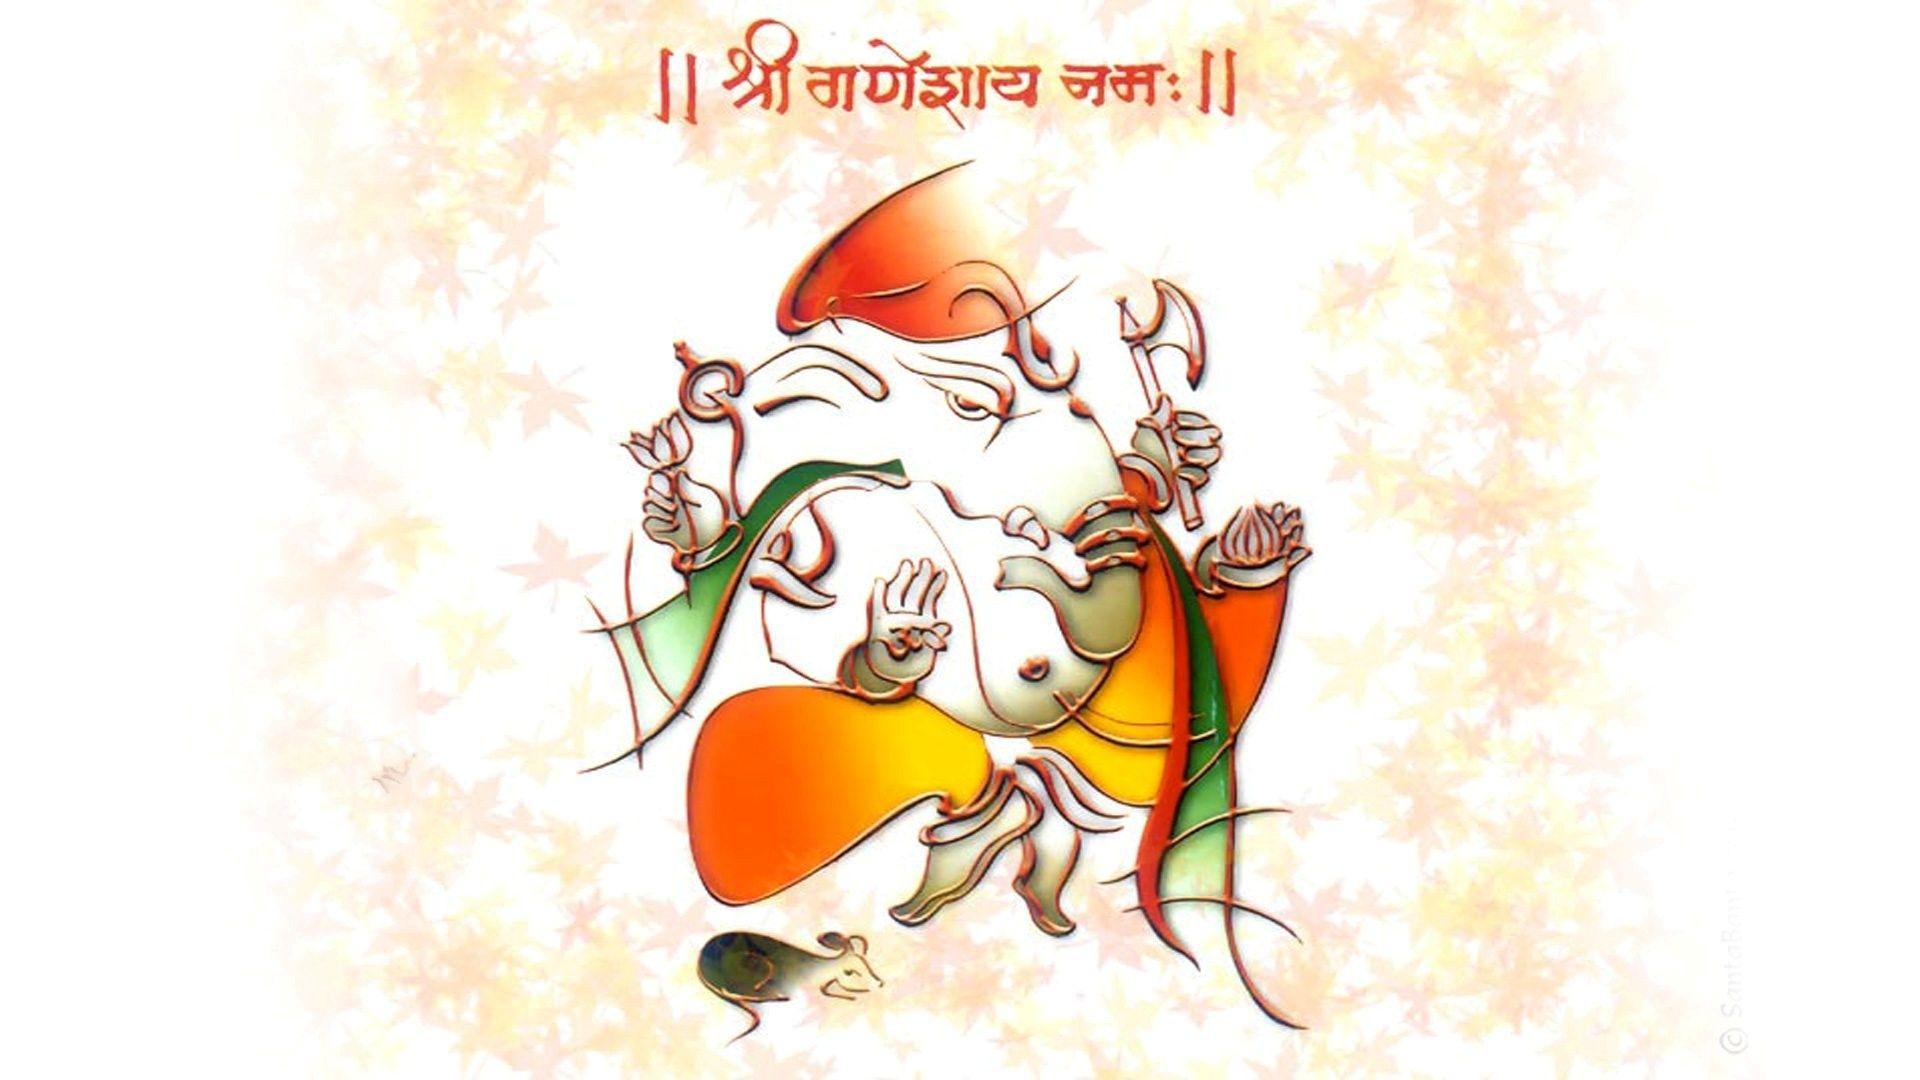 Lord Ganesha Hd Images Free Downloads For Wedding Cards: Shree Ganeshay Namah Hd Wallpapers